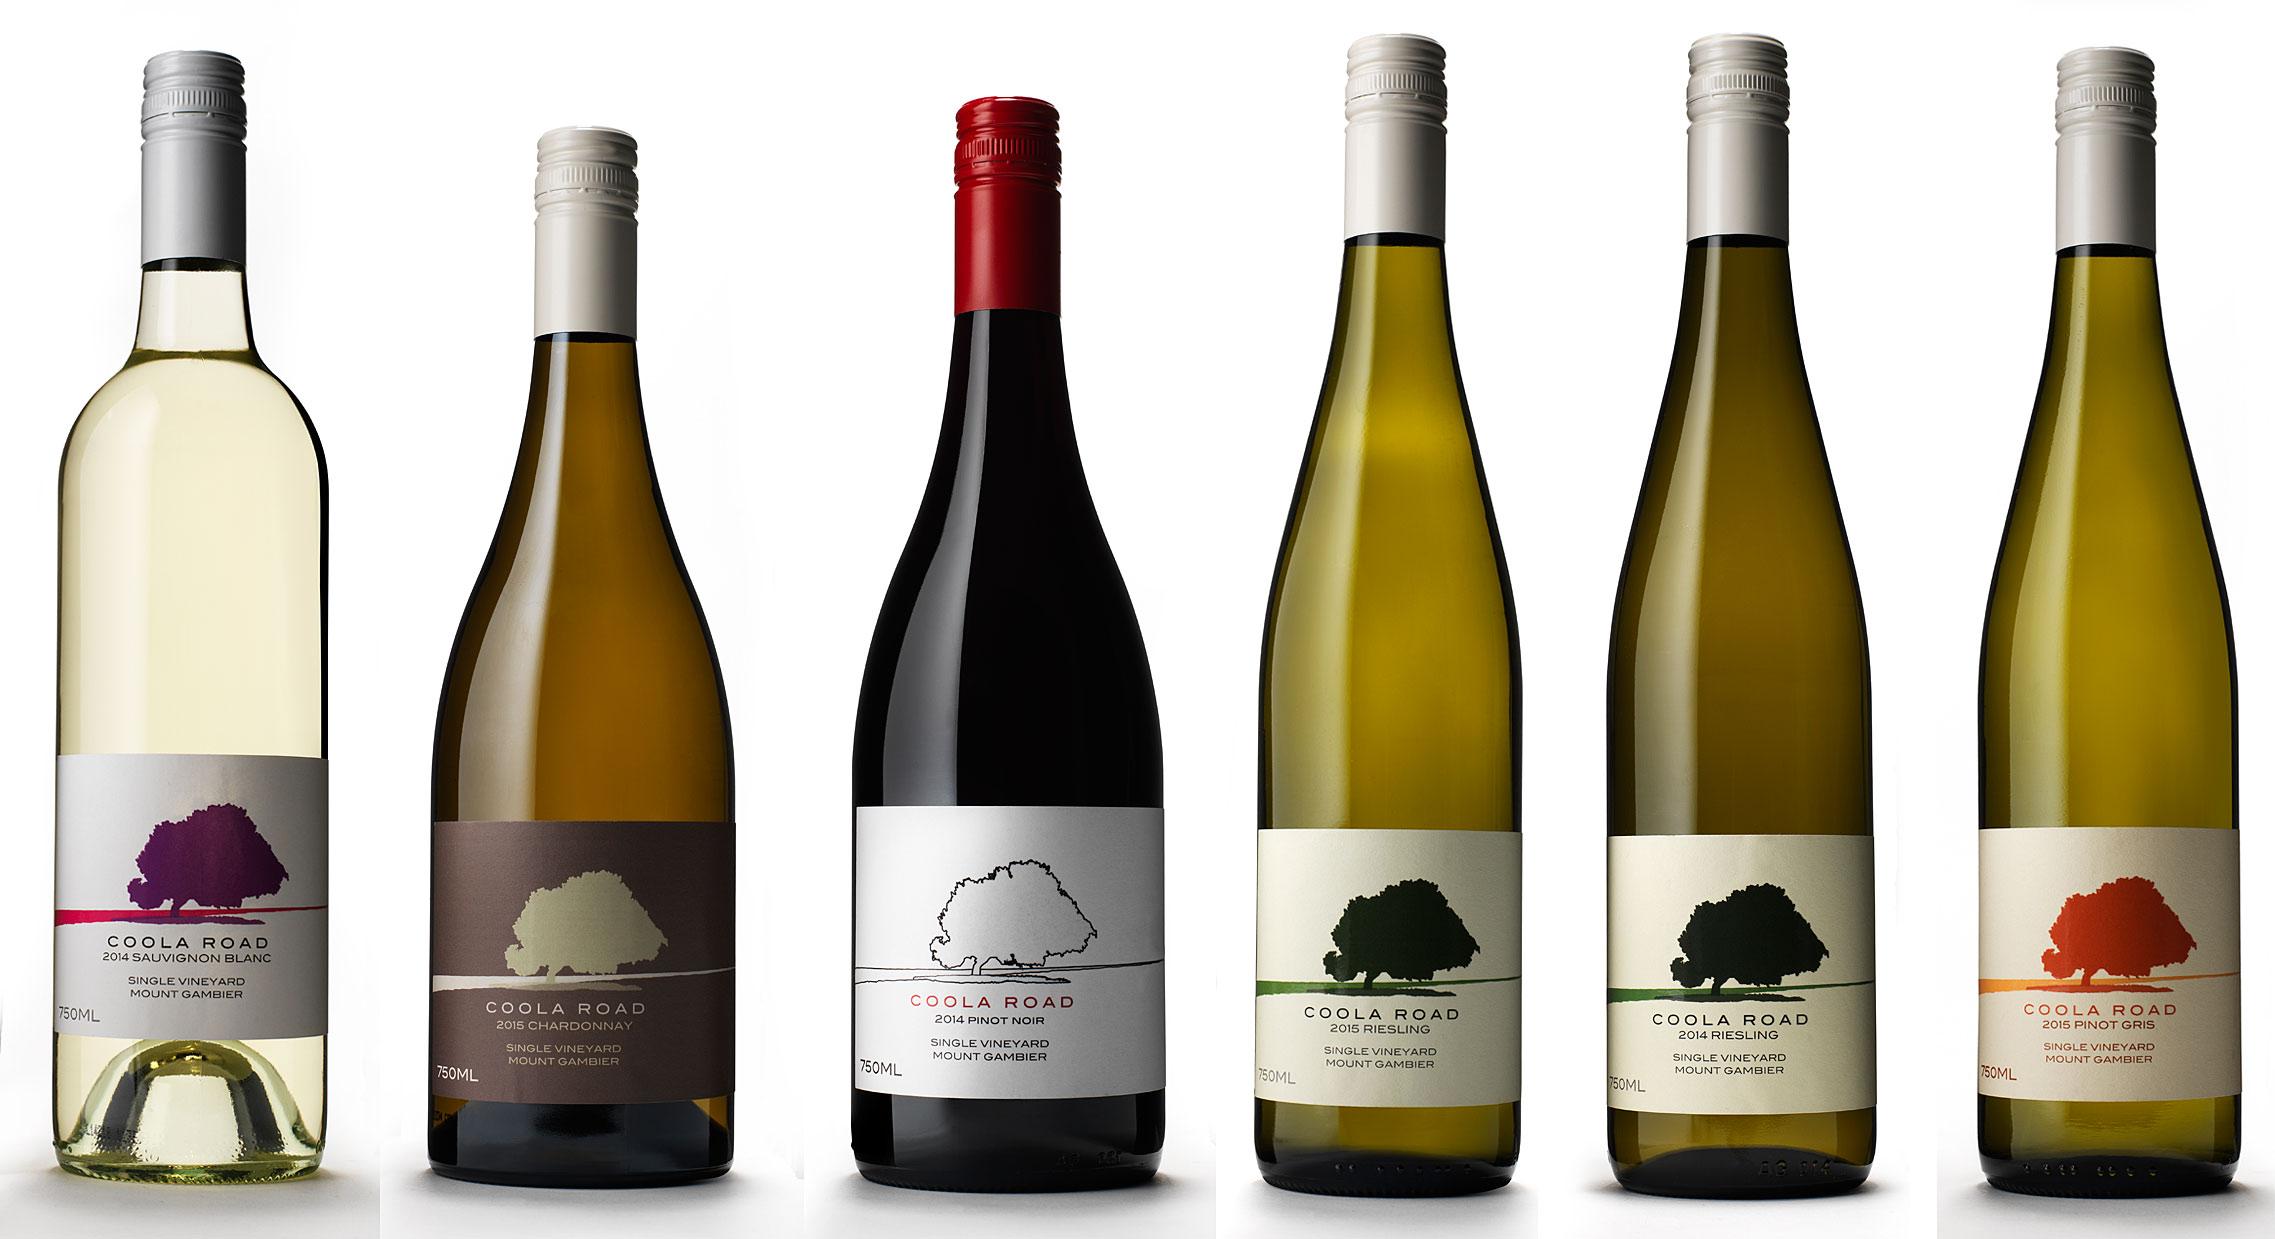 wine-bottle-photography-on-white.jpg